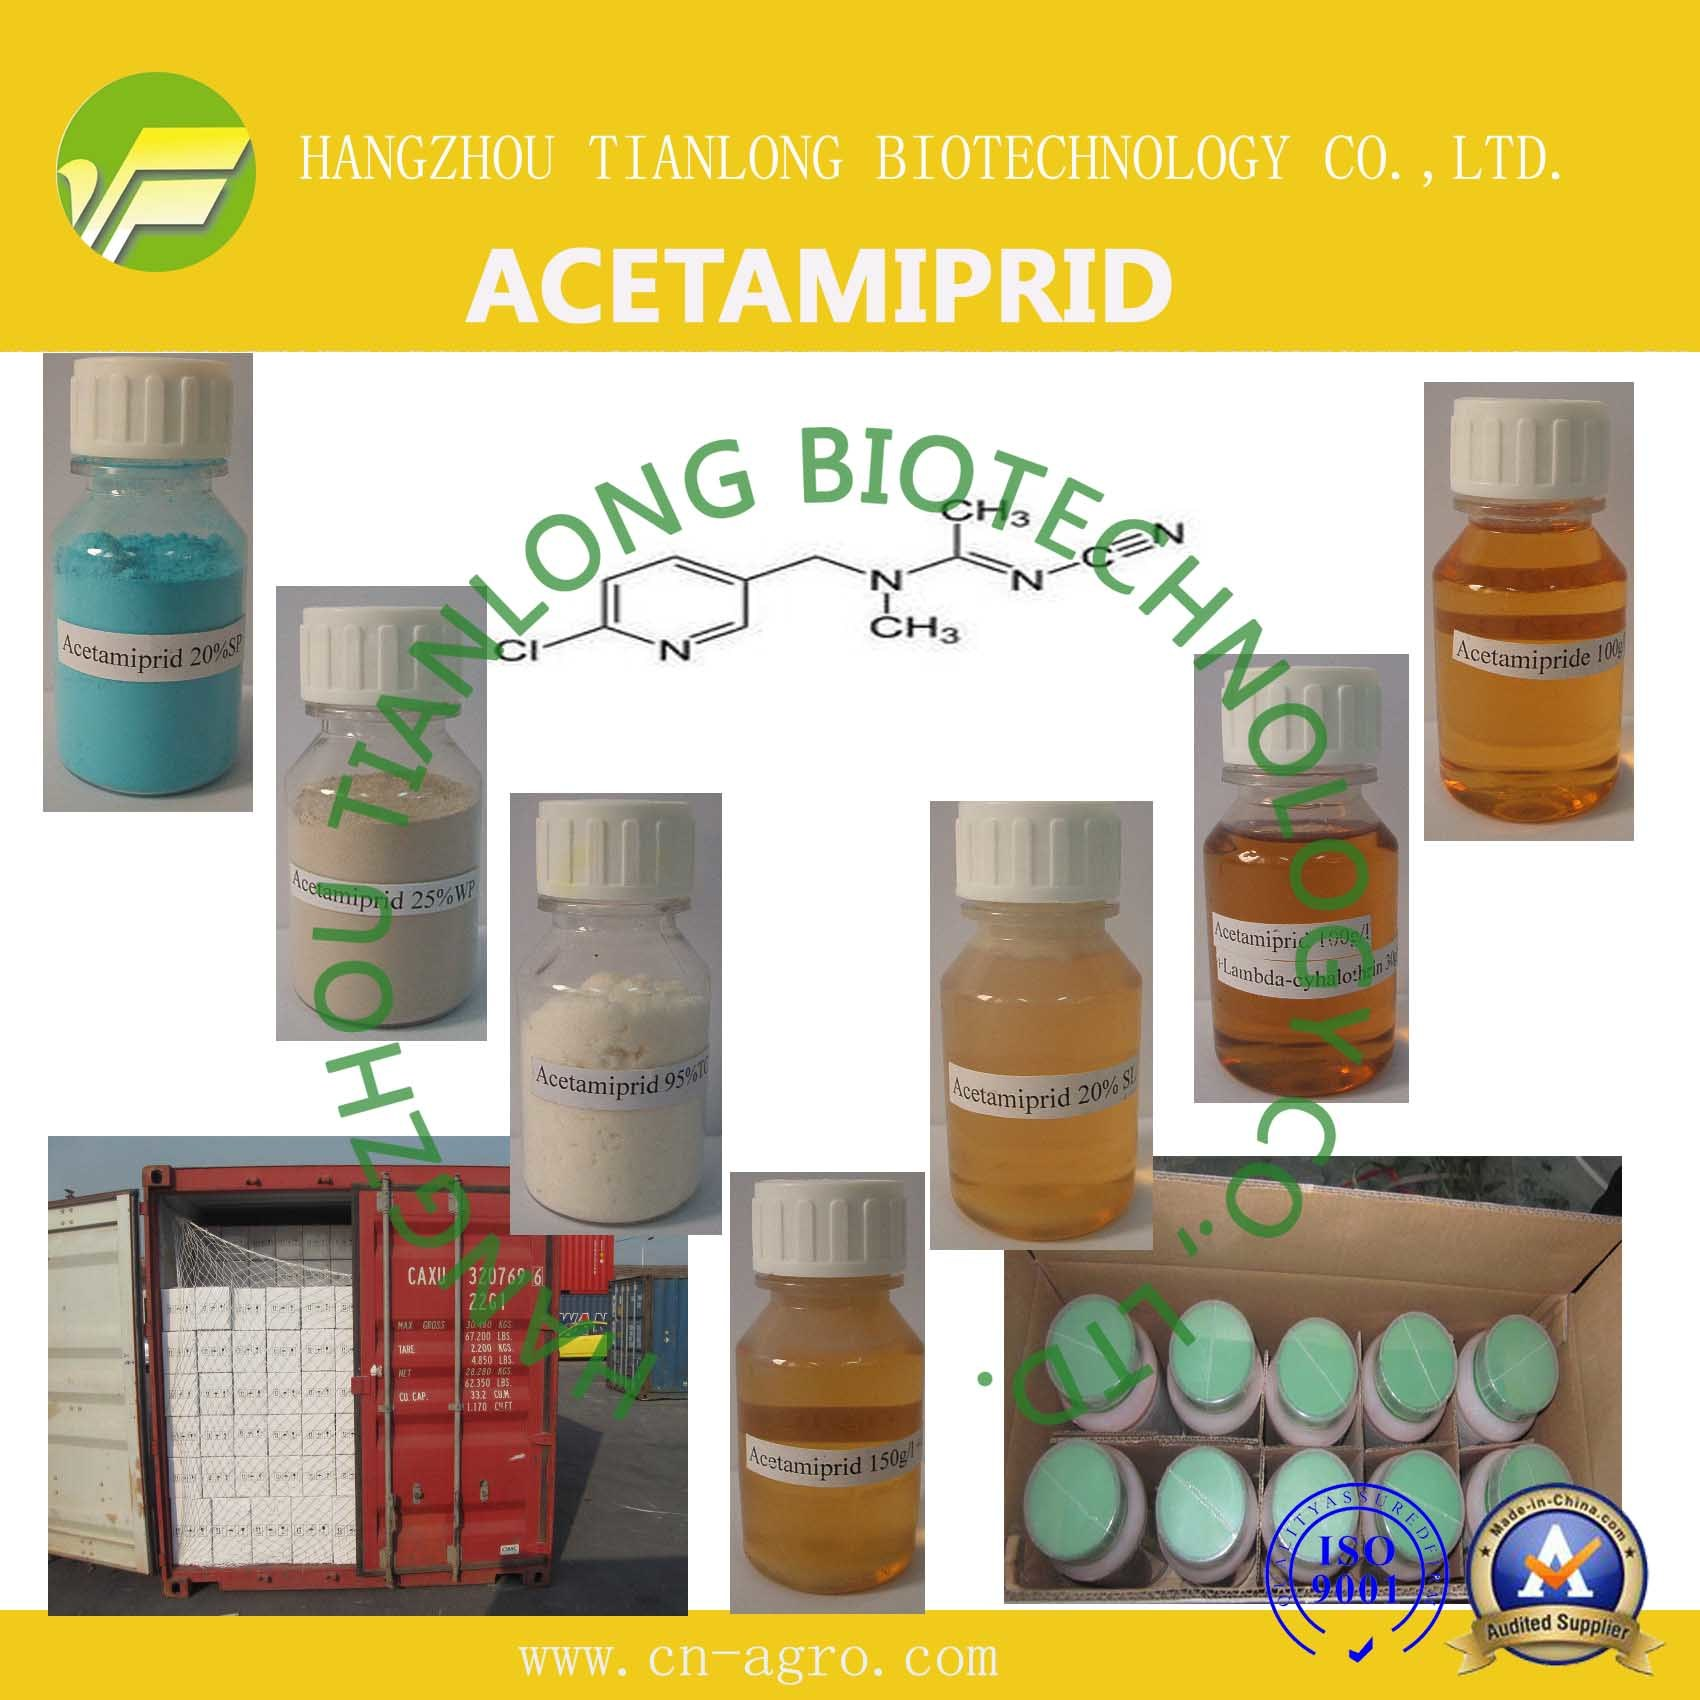 Acetamiprid (95%TC, 20% WP, 20%SP, 20%SL, 70%WDG) (135410-20-7)